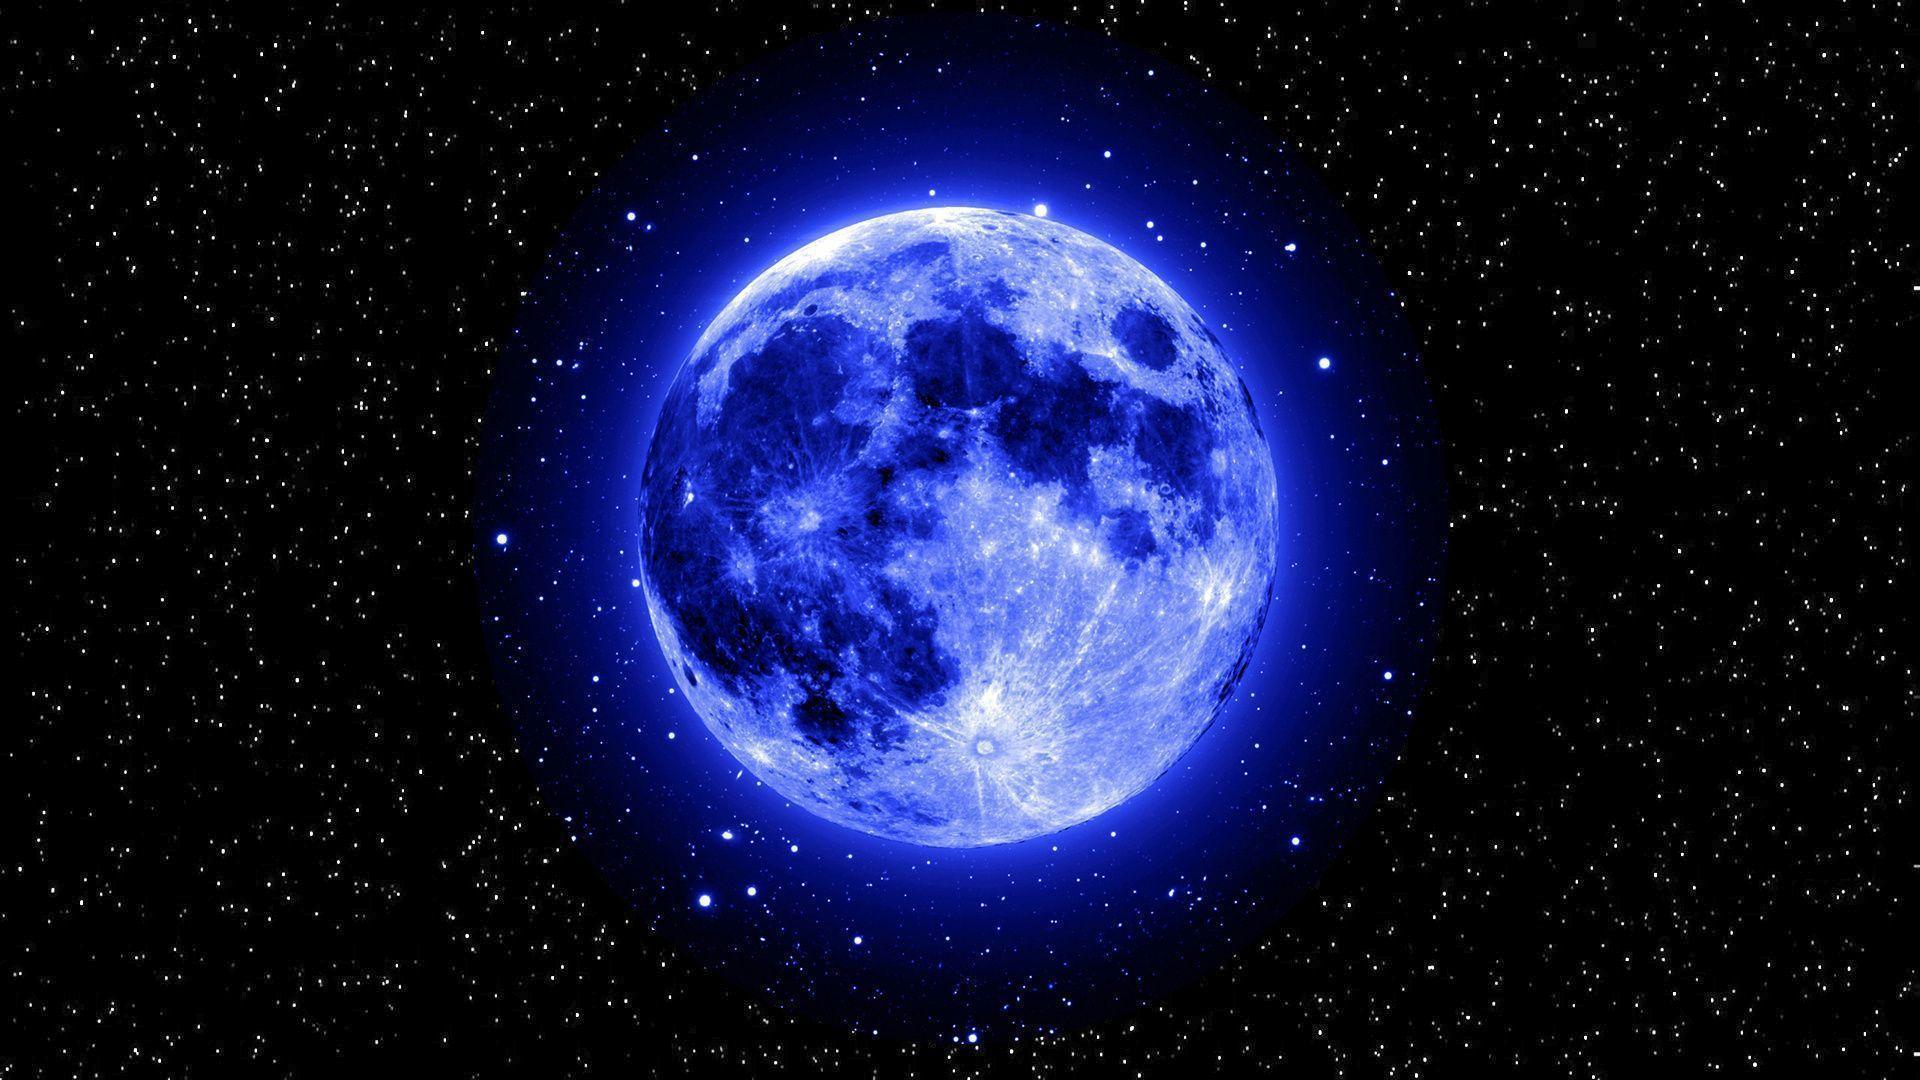 sun moon star background - photo #37